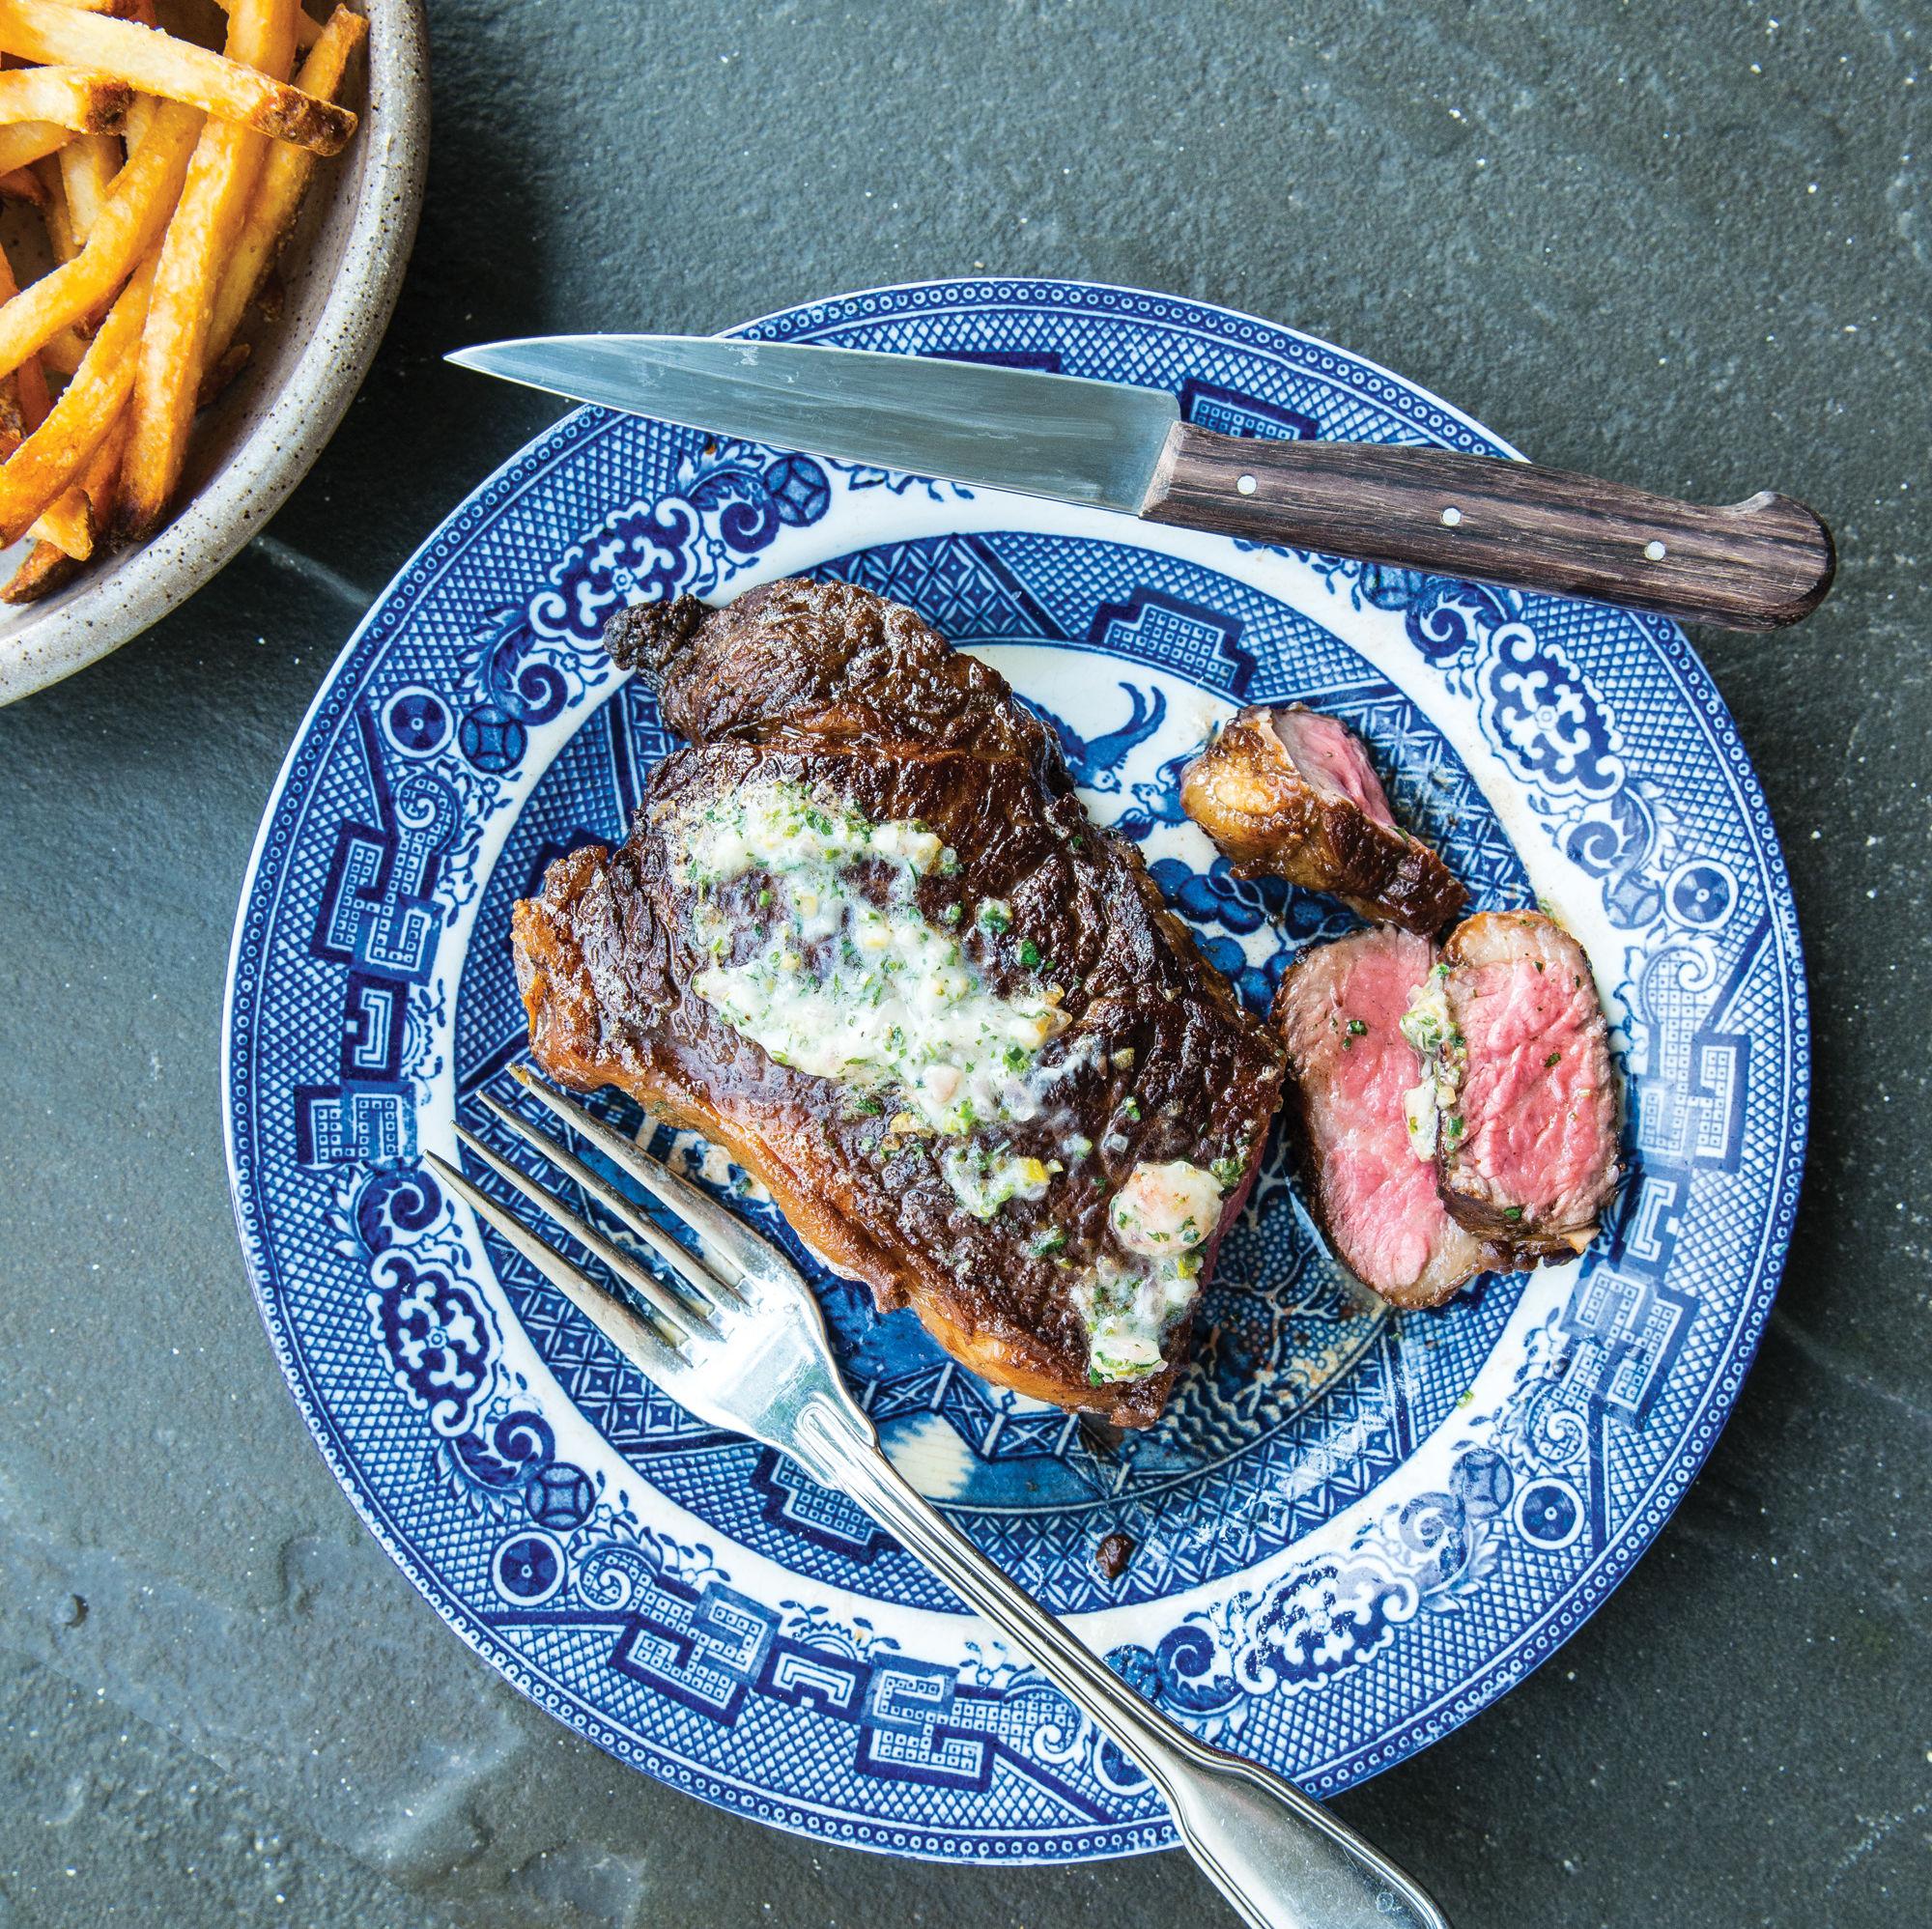 Bateau steak vt3wxt